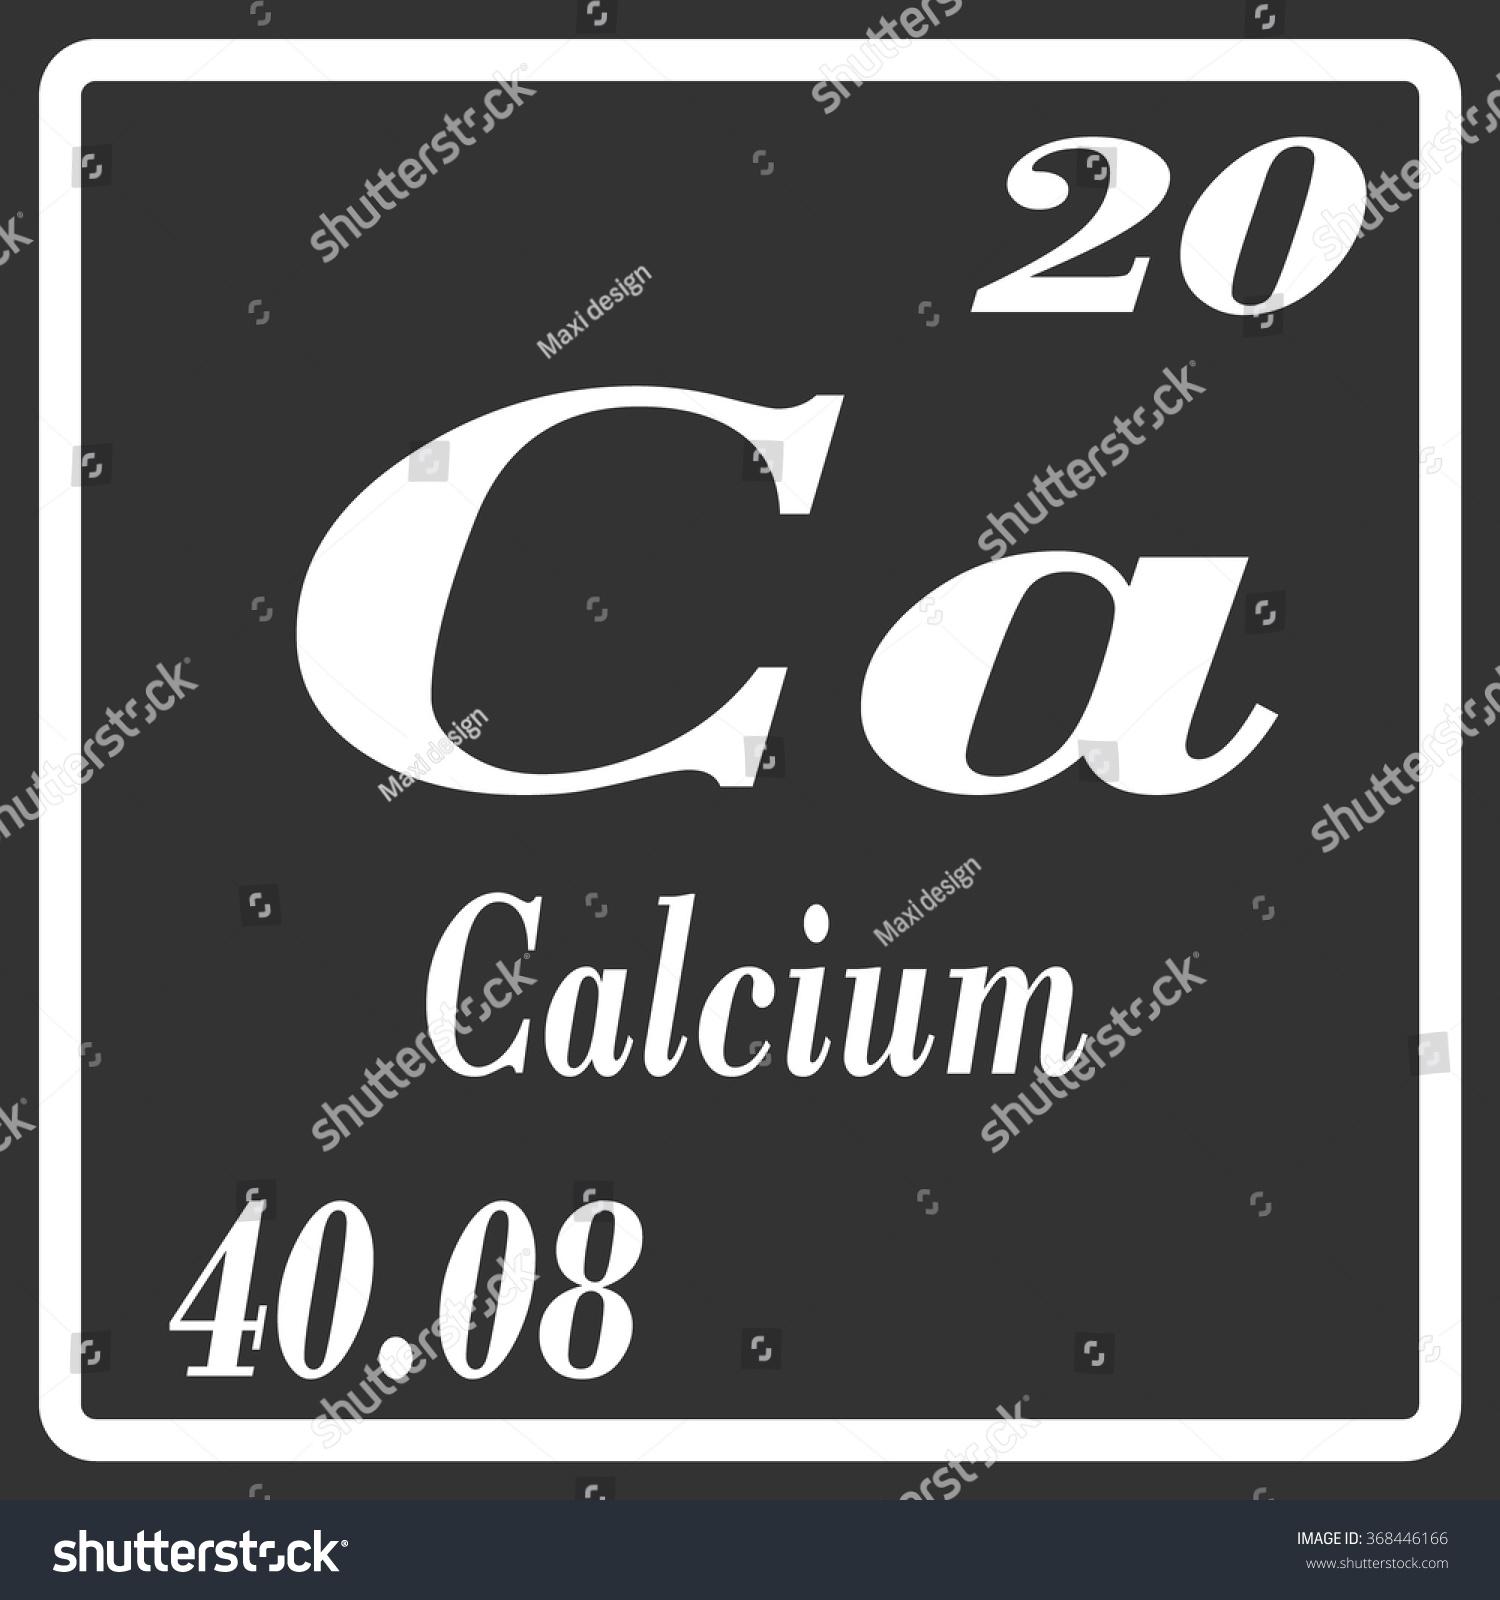 Periodic table elements calcium stock vector 368446166 shutterstock periodic table of elements calcium biocorpaavc